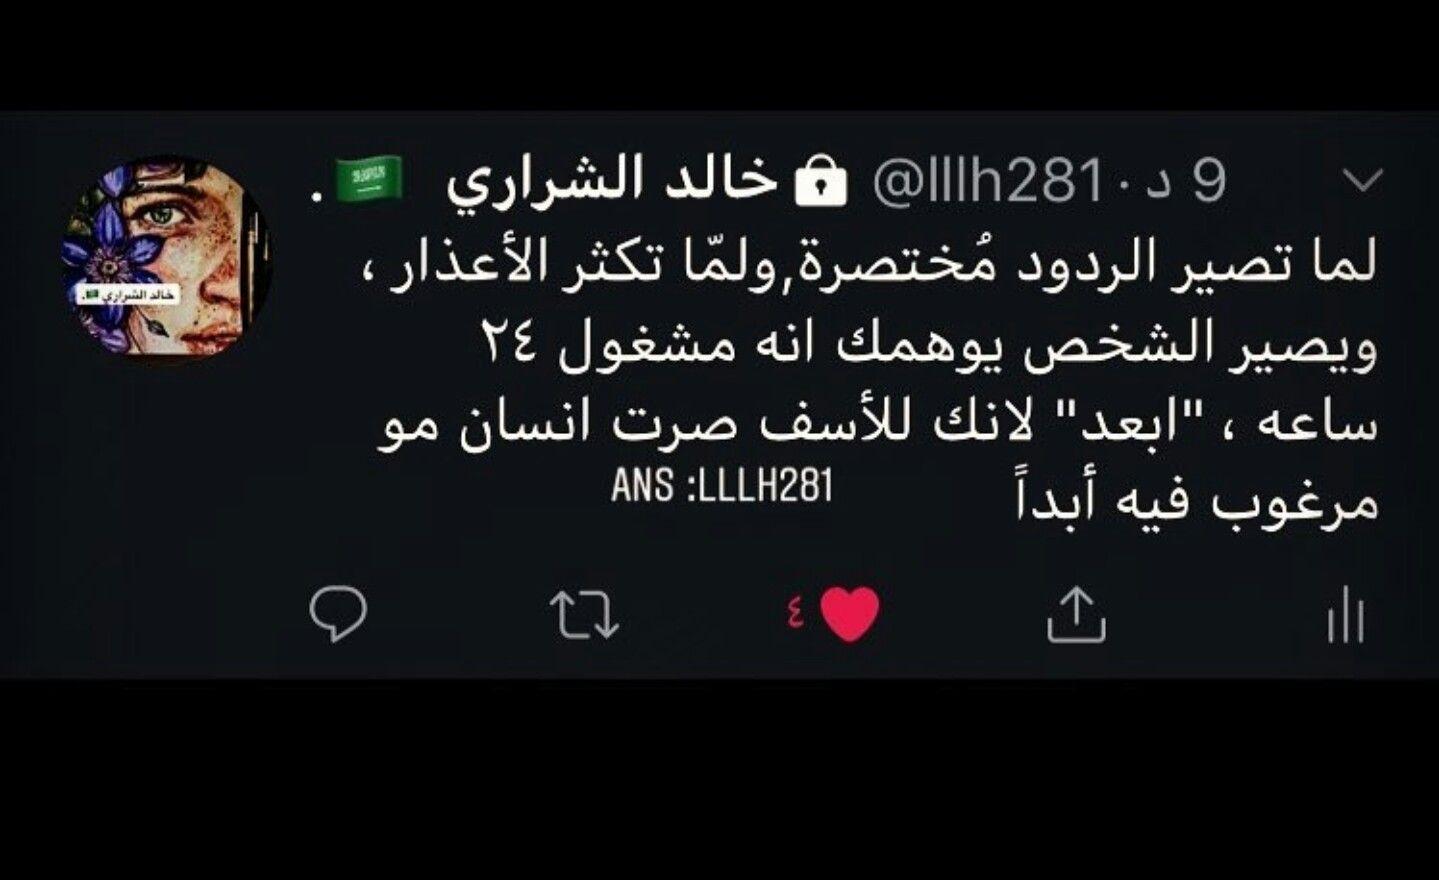 Pin By La Reina Aya On تغريدة سوداء Black Tweet Quotes Words Incoming Call Screenshot